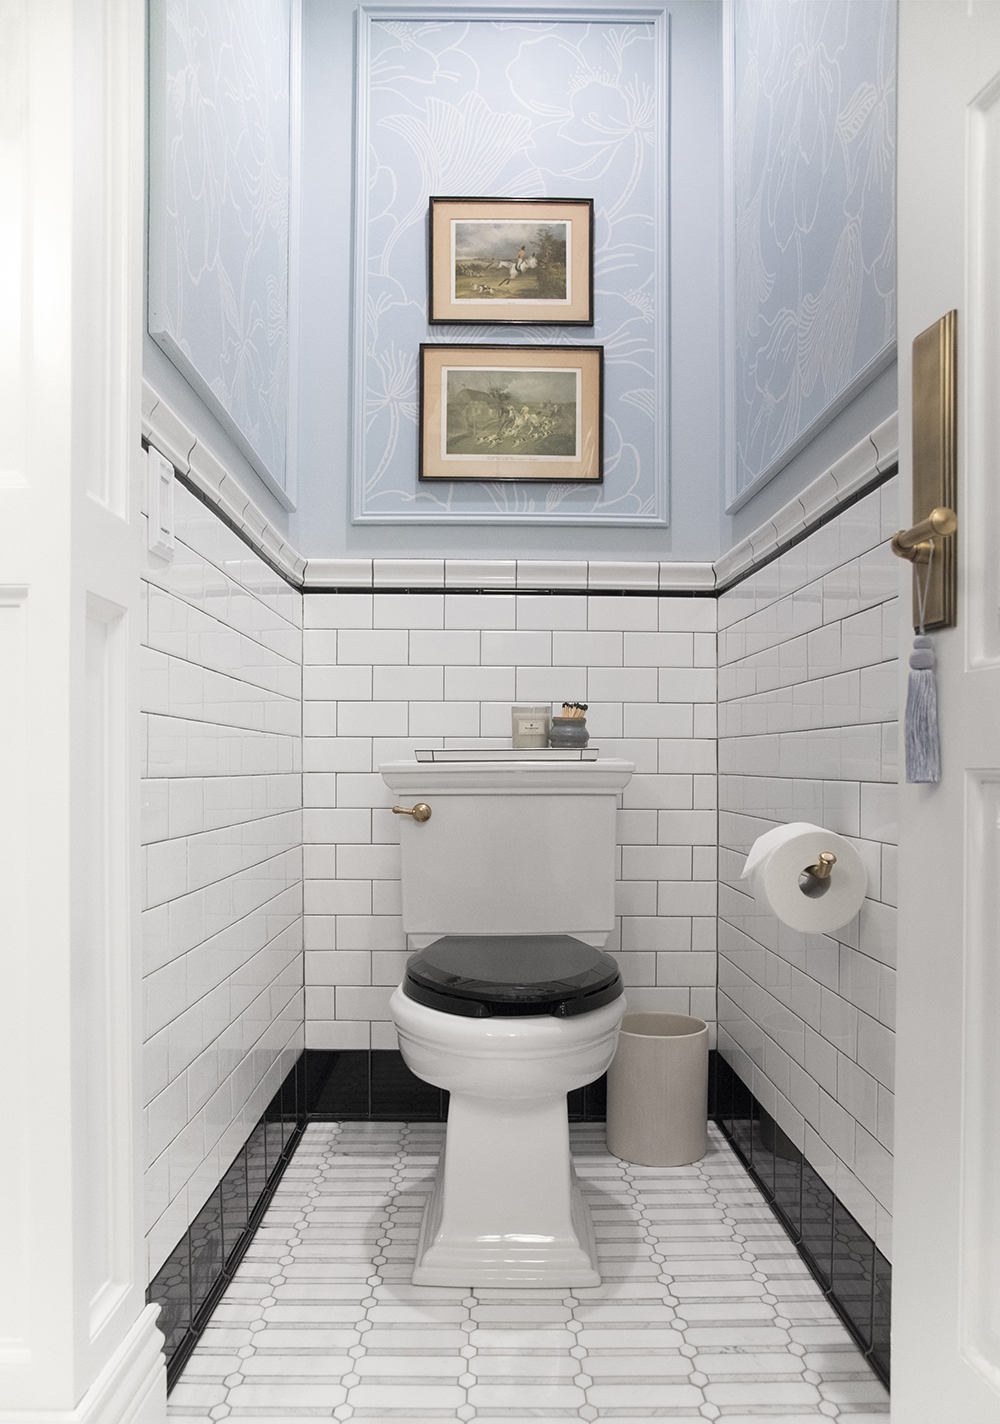 Designer Trick : Artwork Installation - roomfortuesday.com